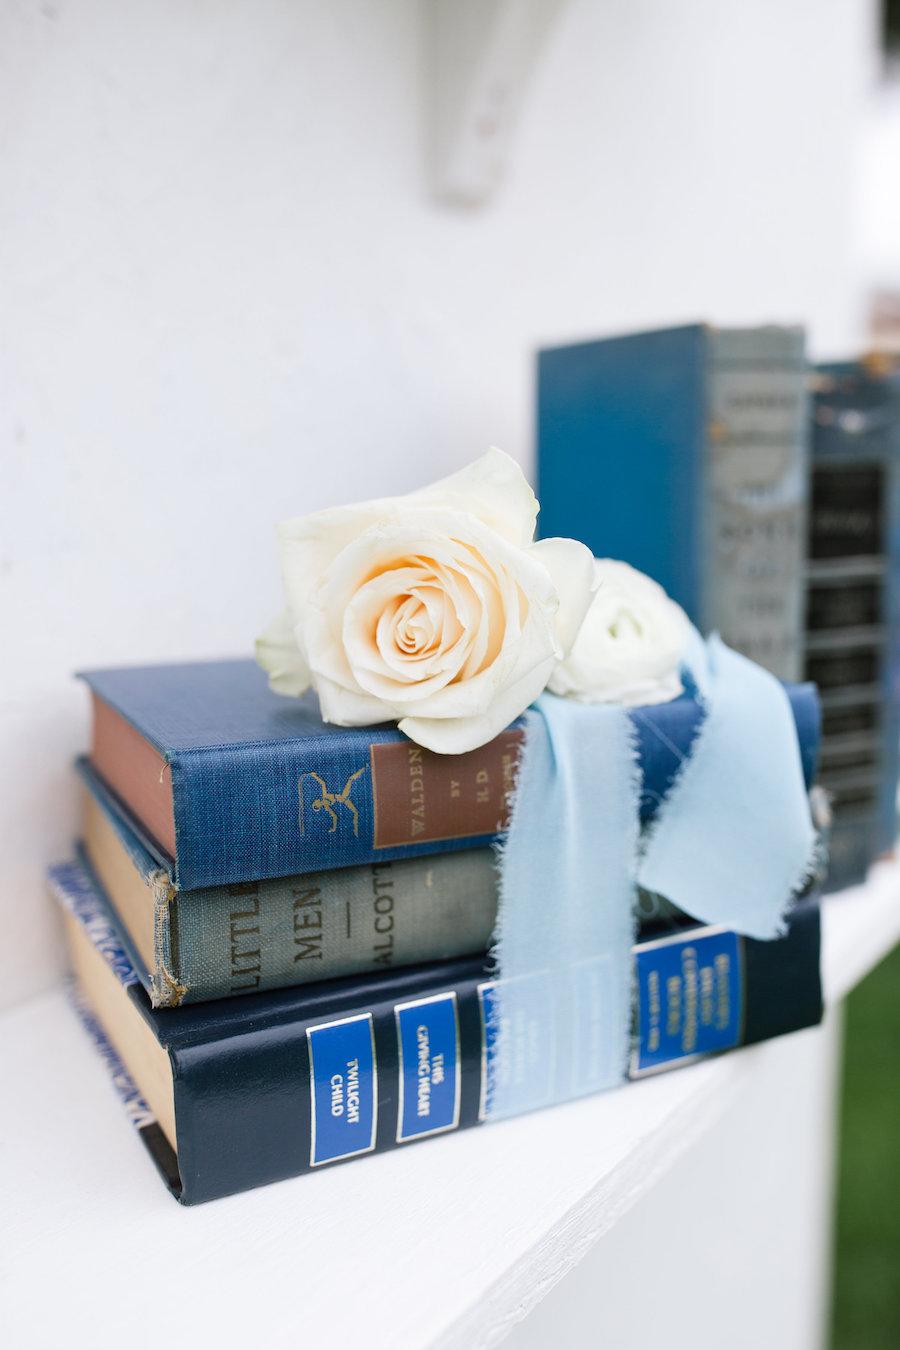 Kathleen Blue Decortive Books, Set of Three 4 - Provenance Vintage Rentals Los Angeles Vintage Rentrals Near Me Vintage Book Rentals Vintage Prop Rentals Prop Styling Party Rentals Near Me Los Angeles.jpg